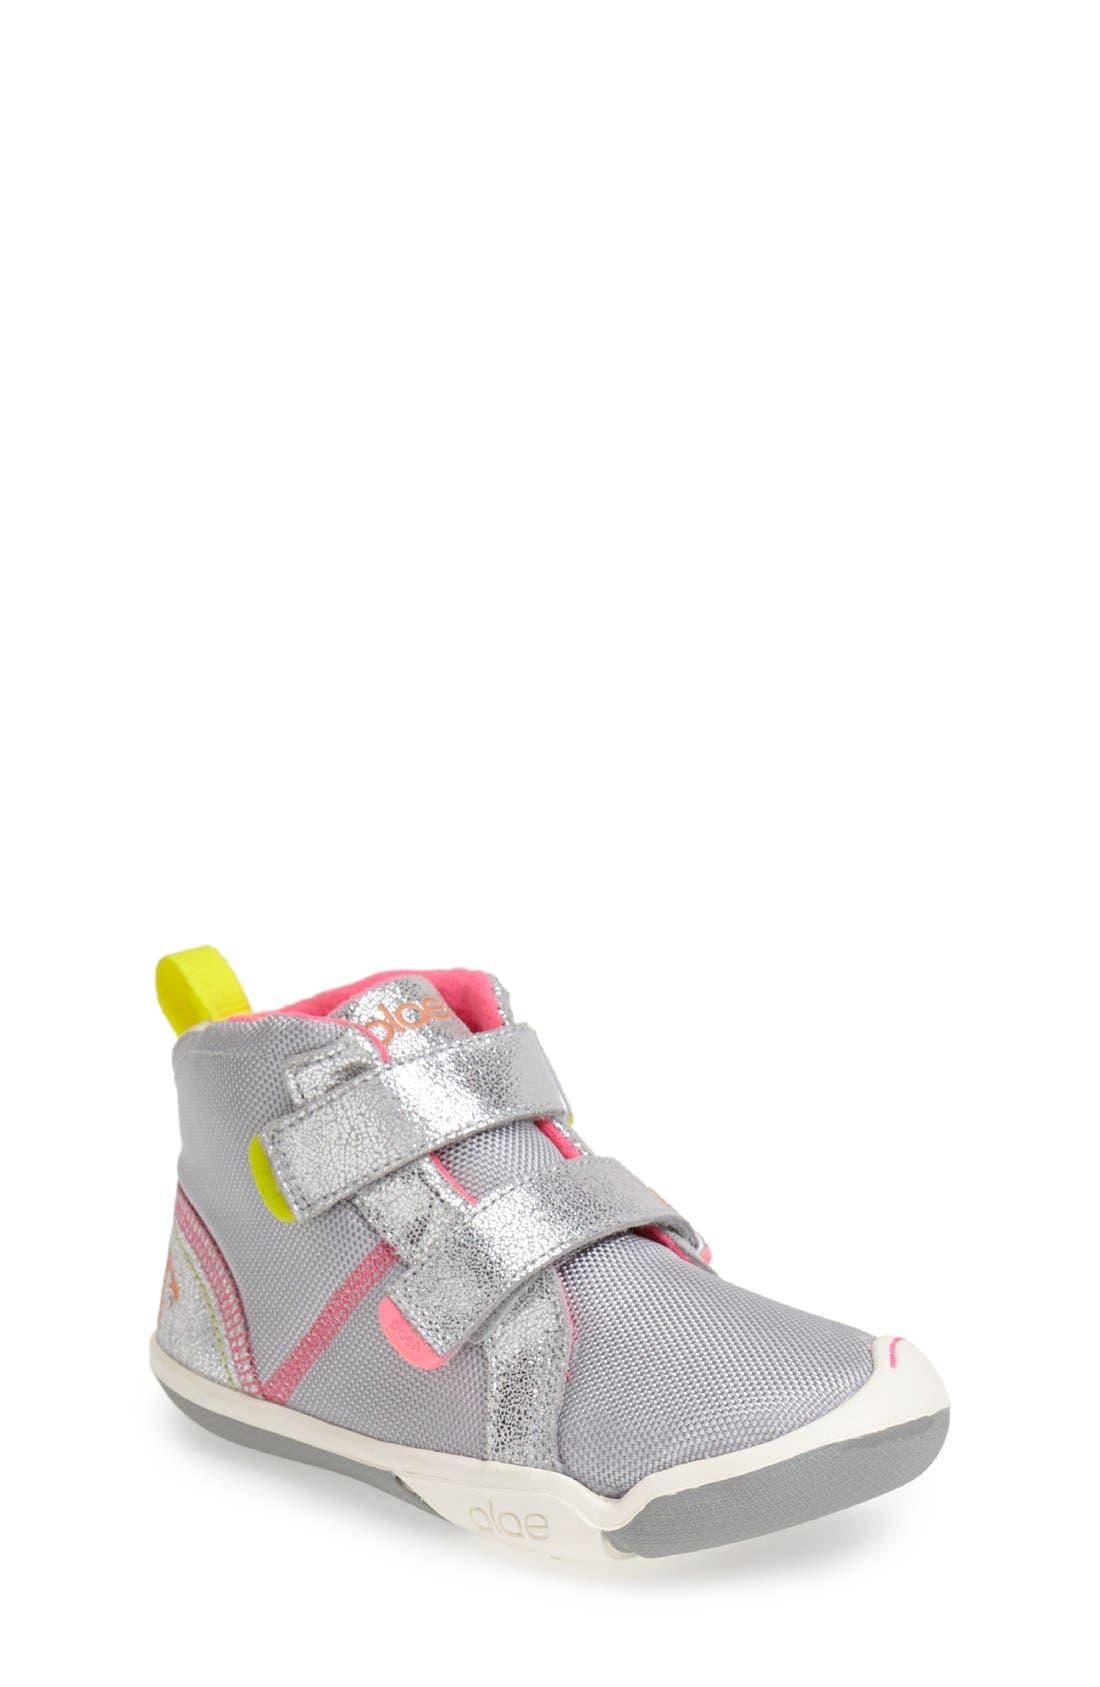 PLAE Max Customizable High Top Sneaker